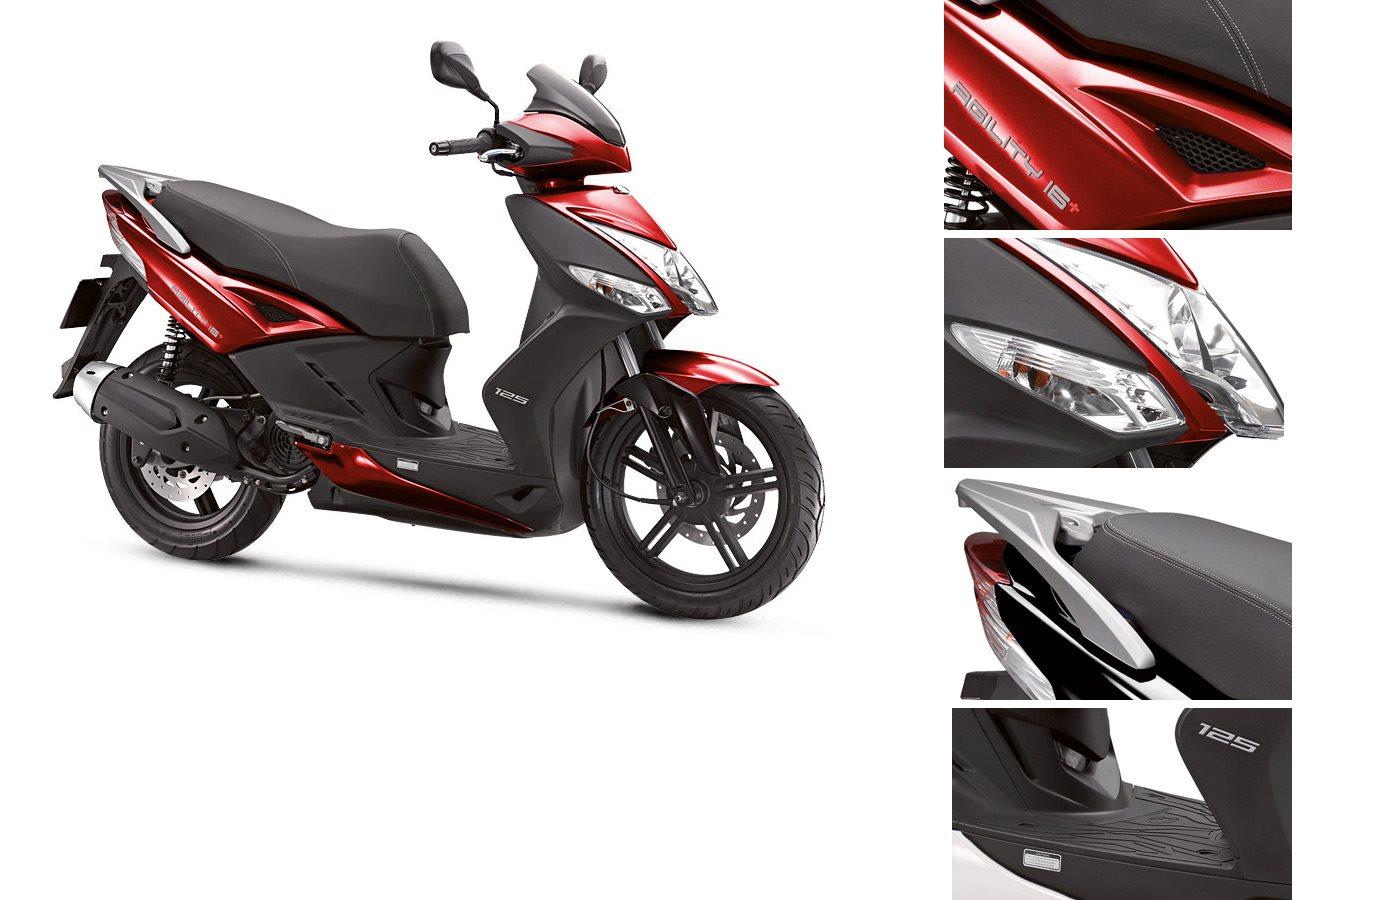 kymco agility 16 plus 125 motorrad news. Black Bedroom Furniture Sets. Home Design Ideas